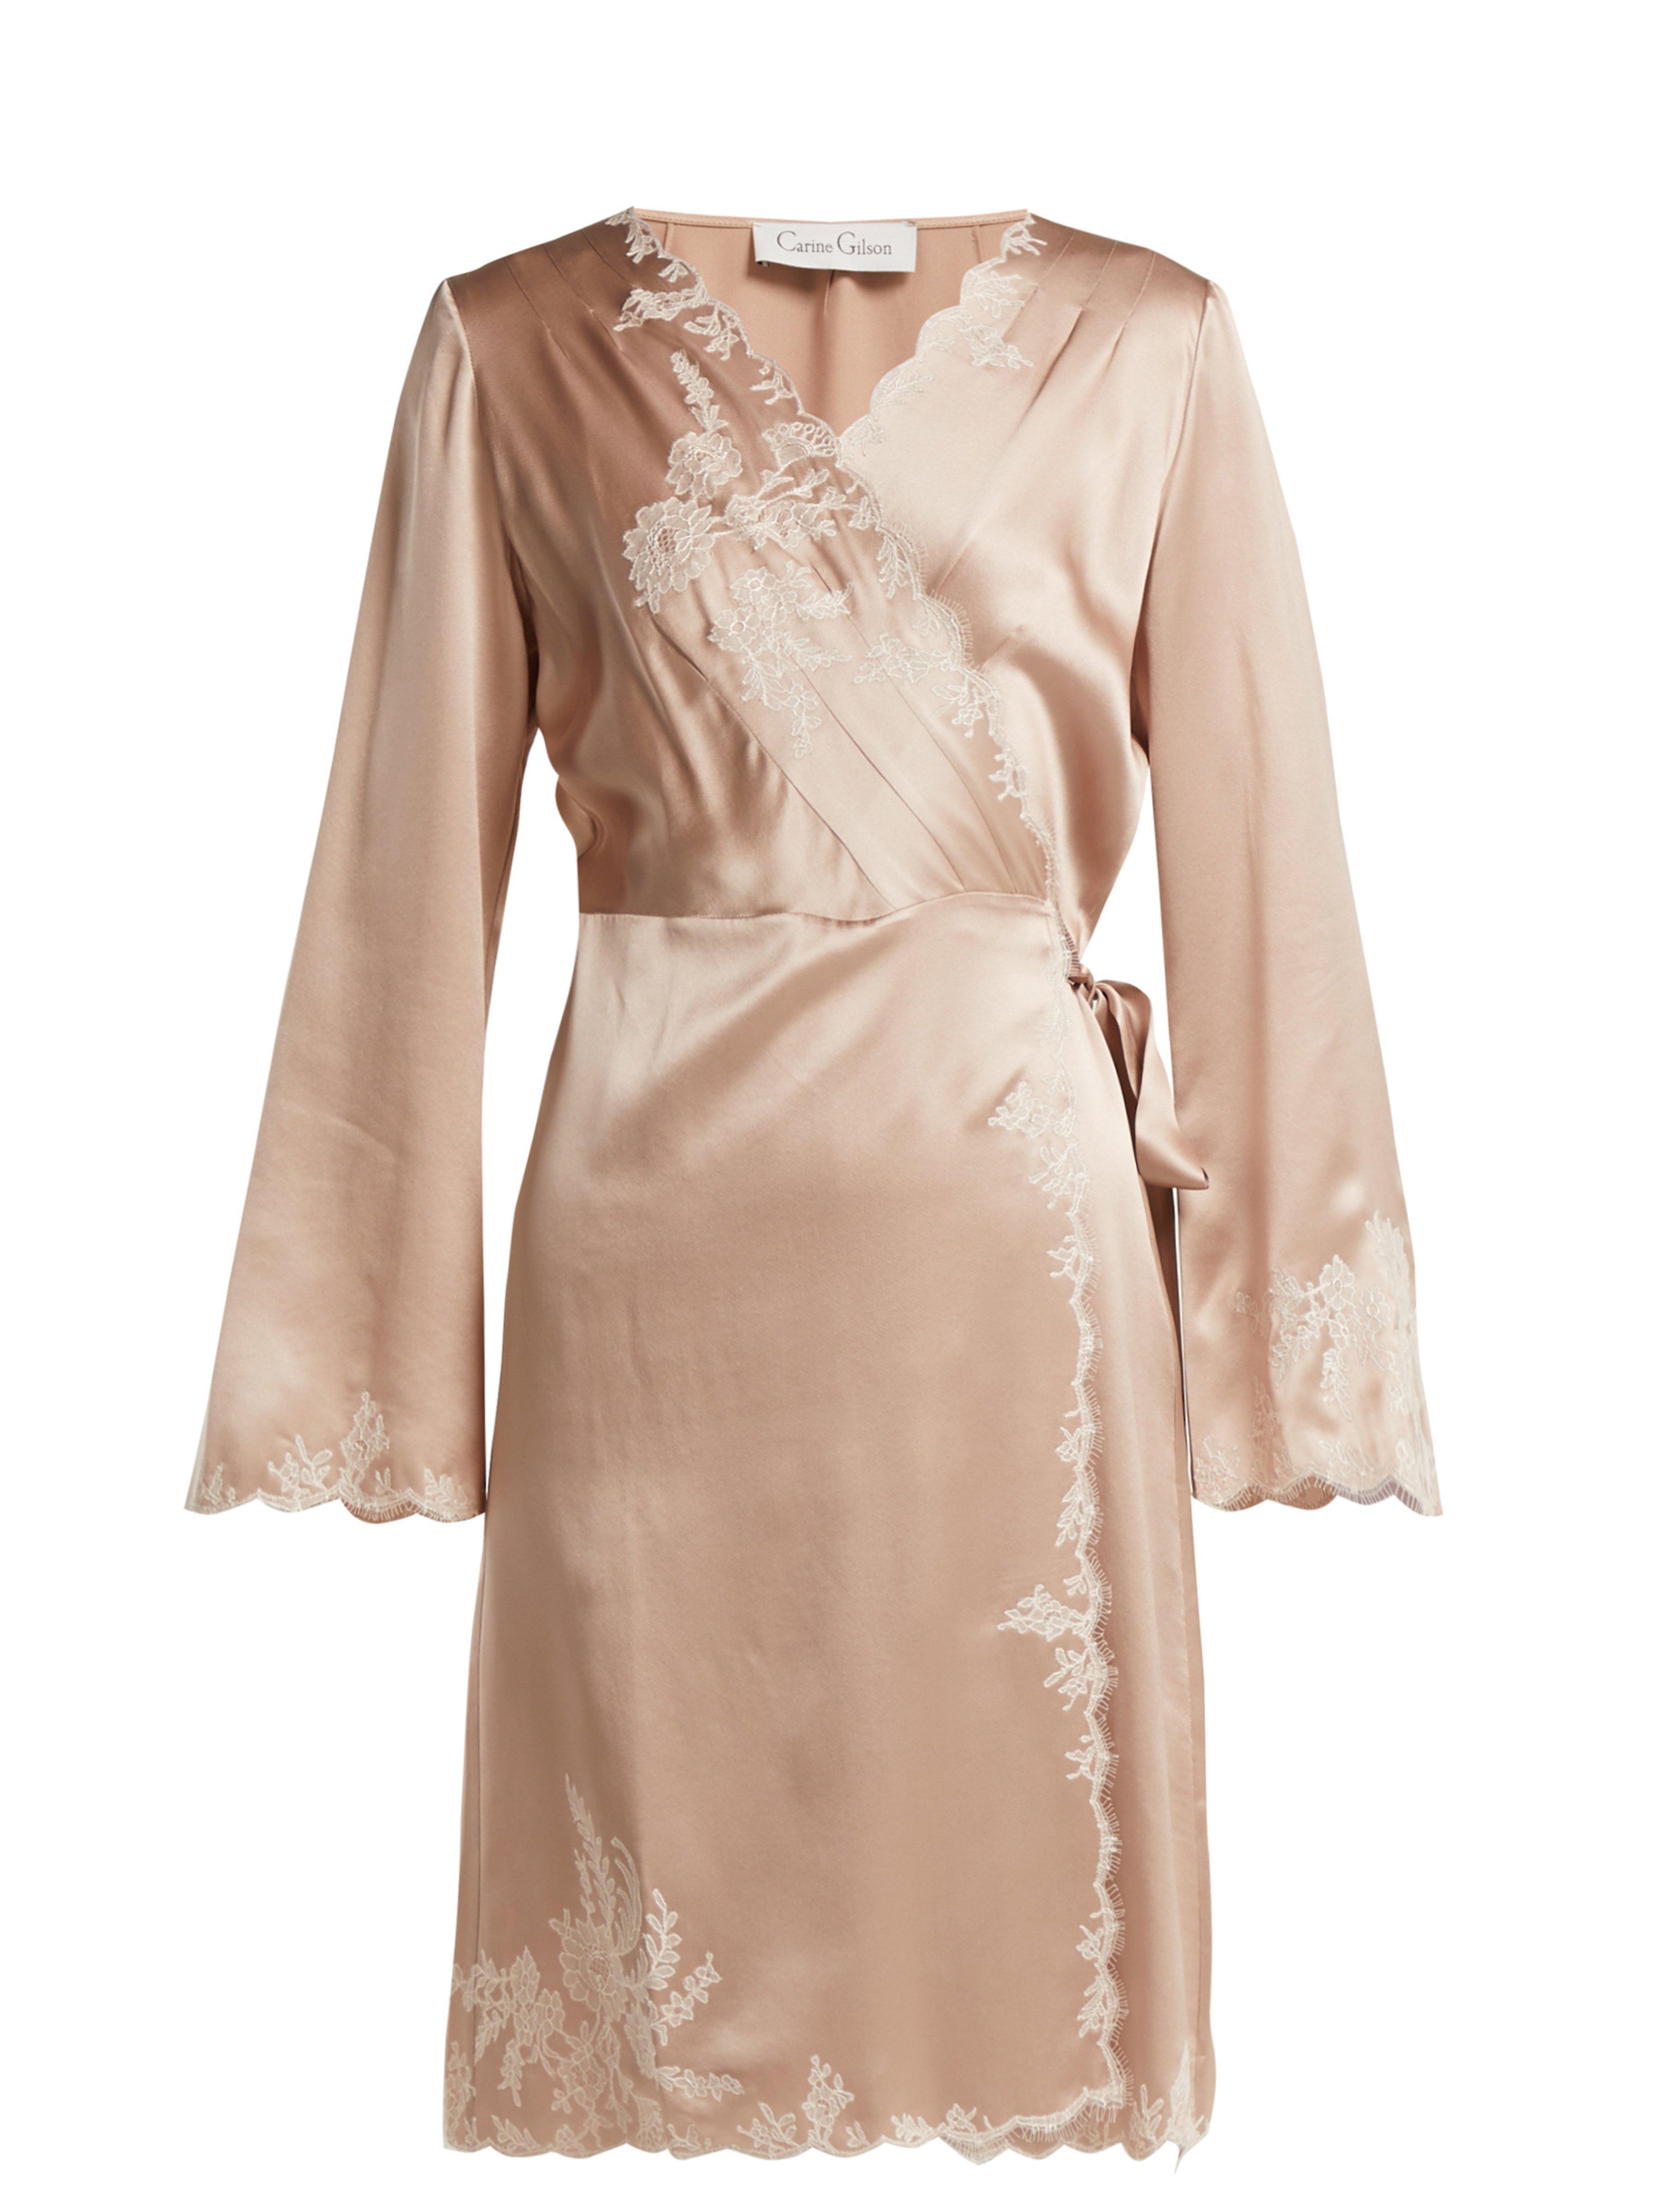 97a6ef5097e Carine Gilson - Pink Lace Trimmed Silk Satin Robe - Lyst. View fullscreen